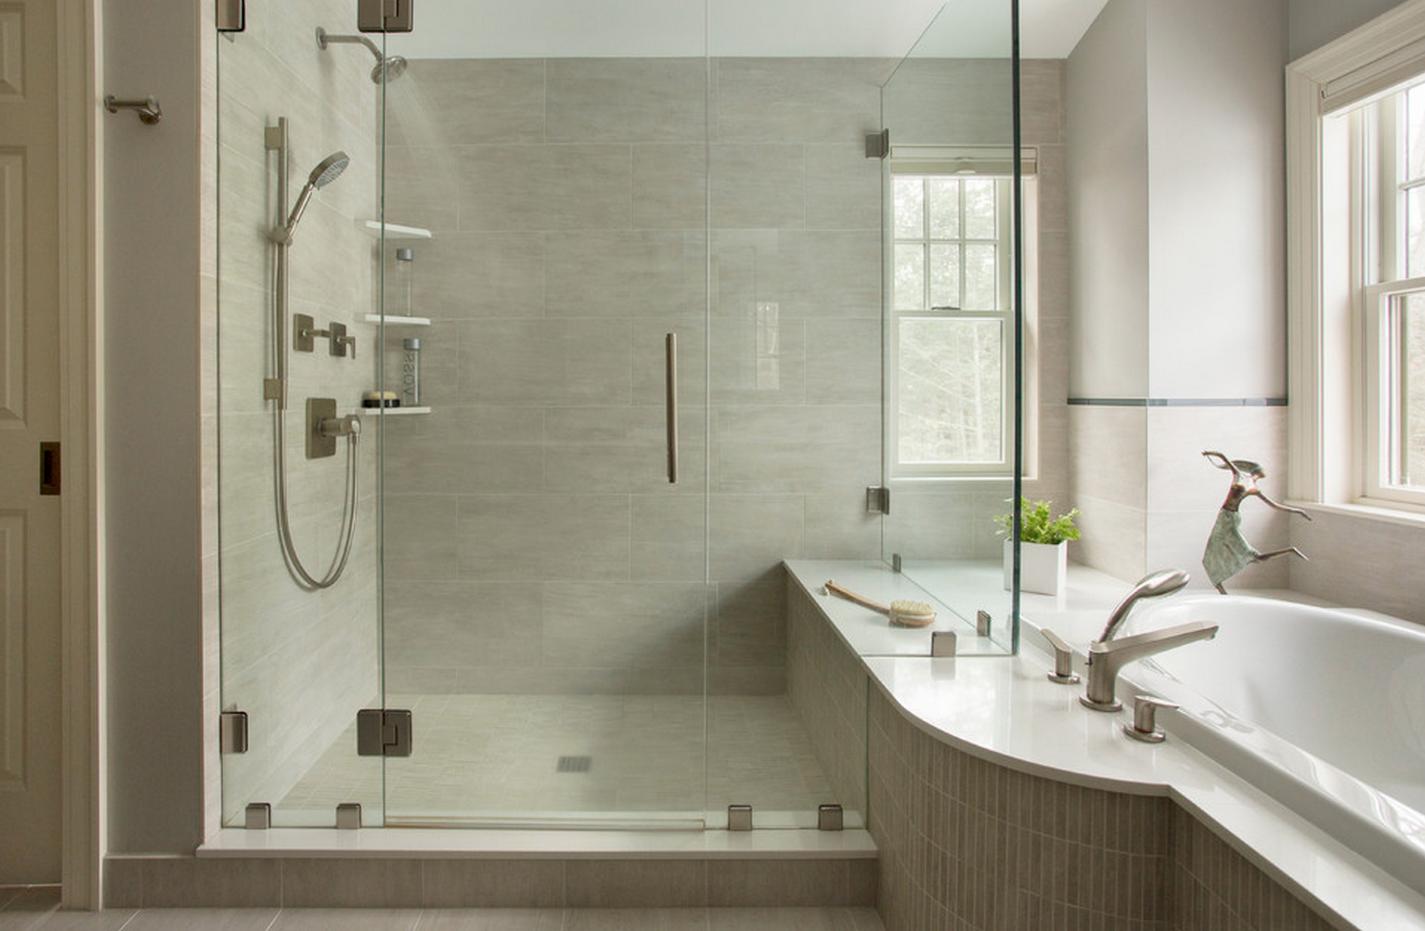 Guest Bathroom Colors - Houzz: 1939 Brick Colonial (Eric Roth ... on white bathrooms houzz, small bathrooms houzz, master bathrooms houzz, guest bathrooms pinterest, guest bathrooms home, gray bathrooms houzz,